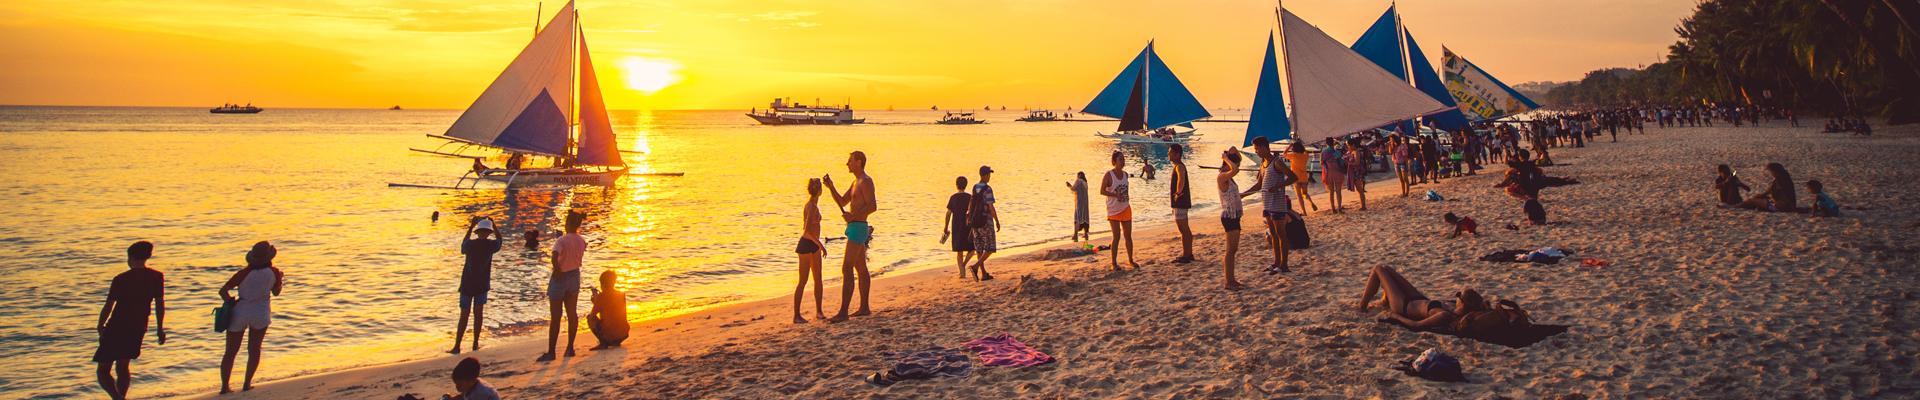 Borocay Island, Philippines